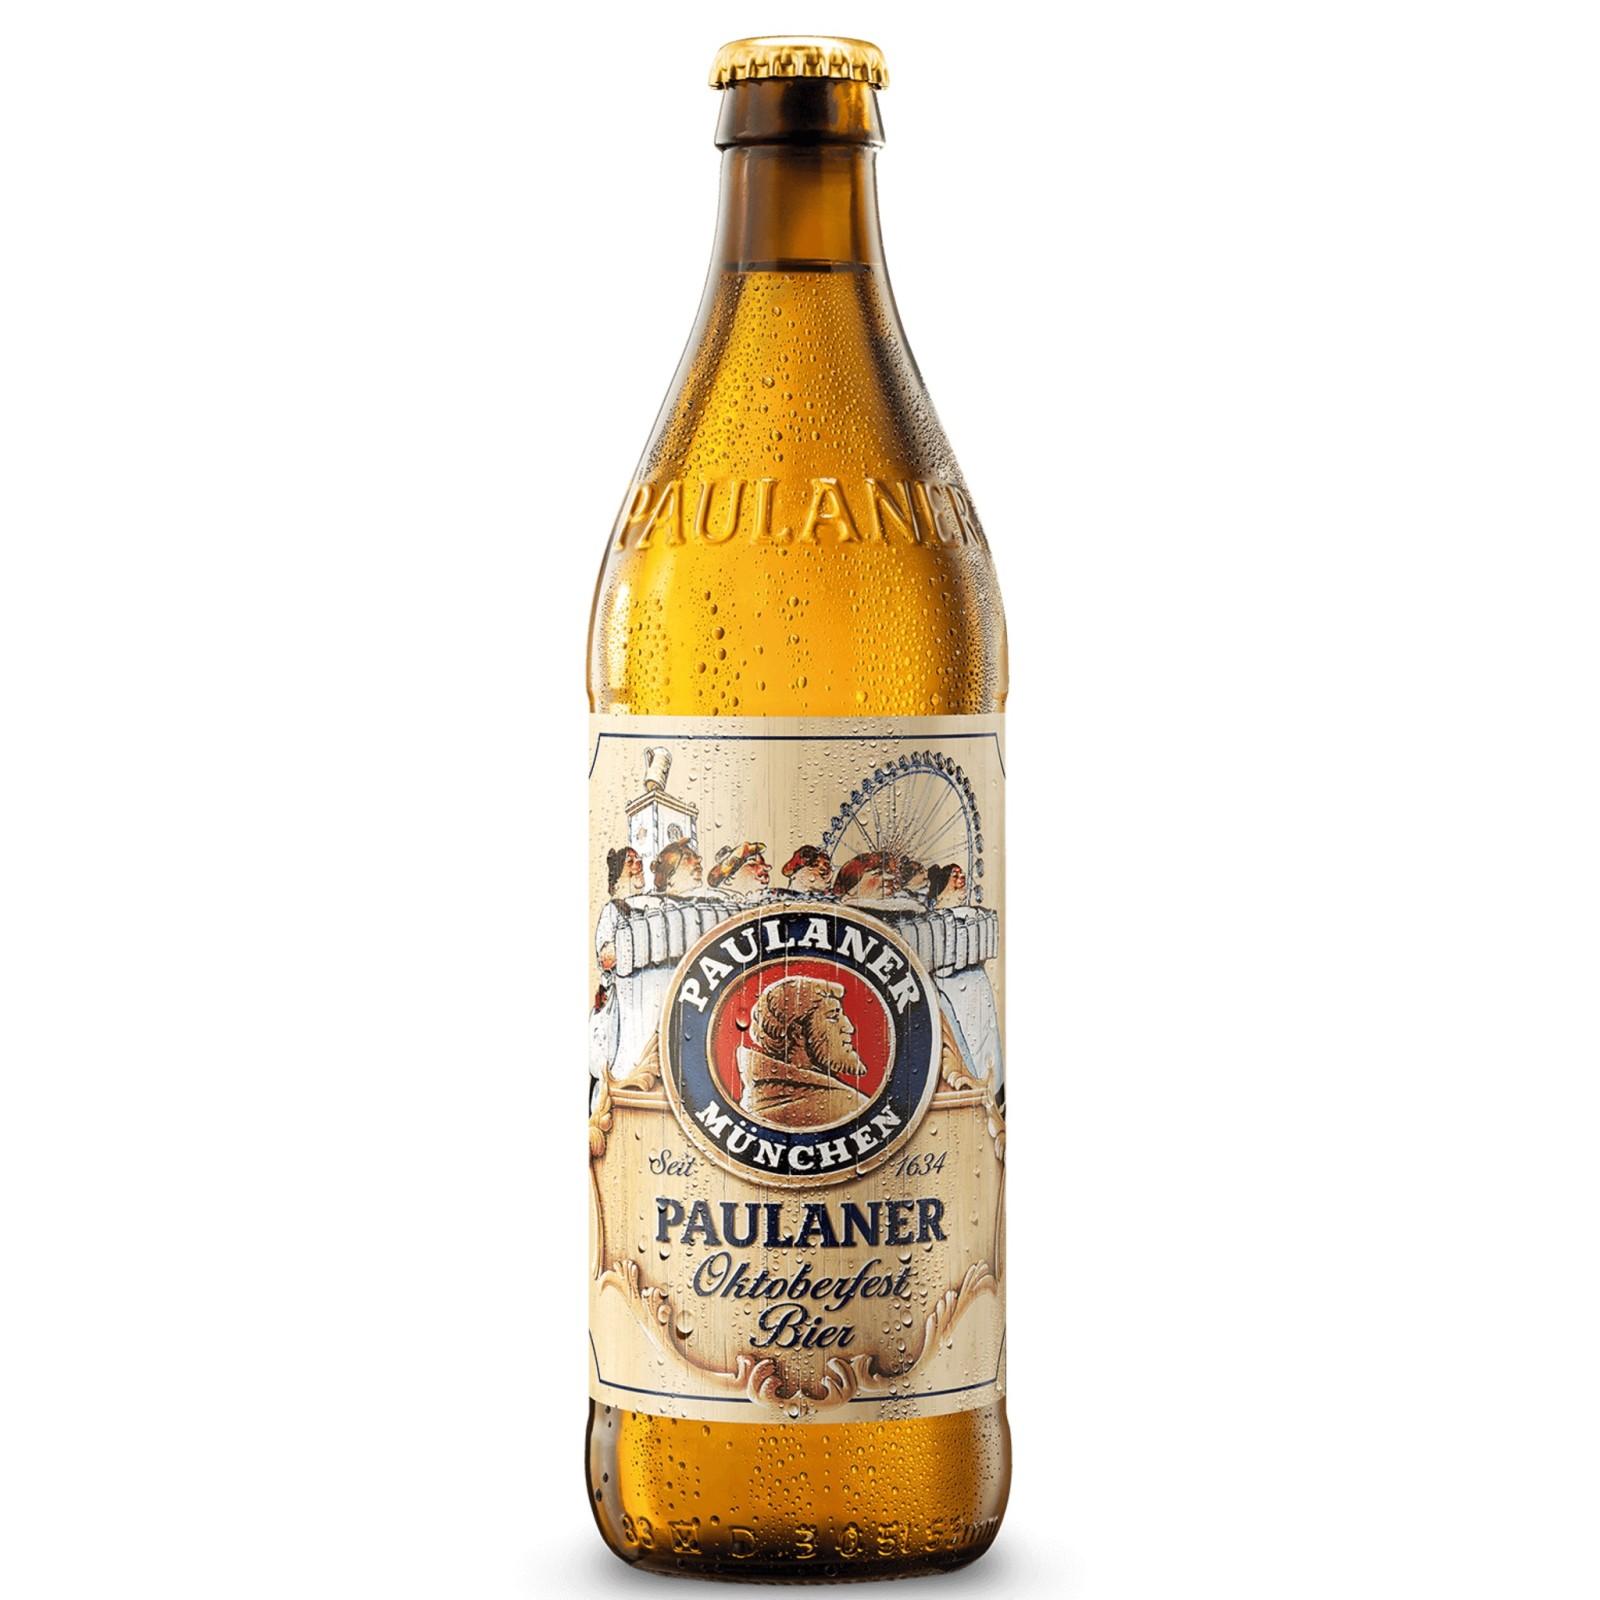 Paulaner Oktoberfest Bier 6% 500ml